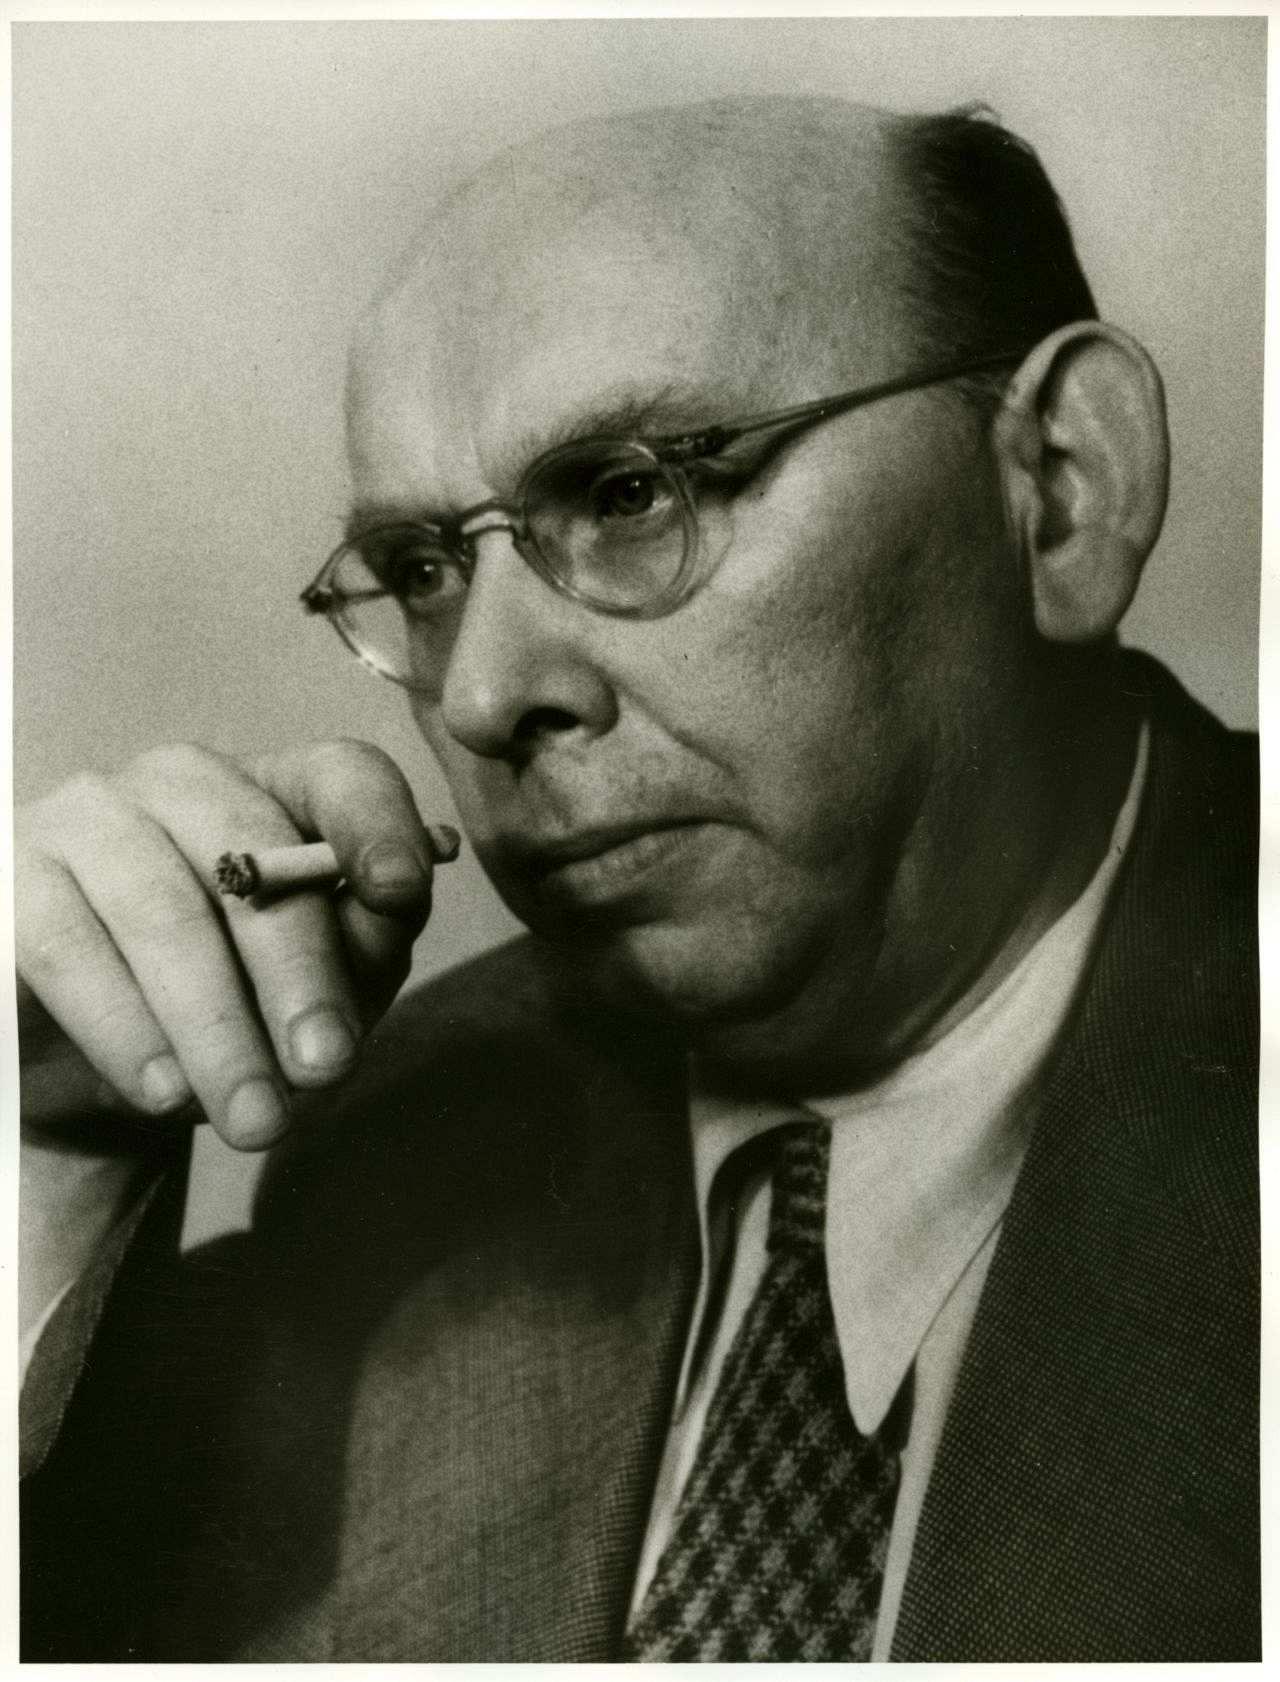 Porträfoto von <b>Hanns Eisler</b>, 1950. - eisler-hanns_foto_LEMO-F-4-259_dhm